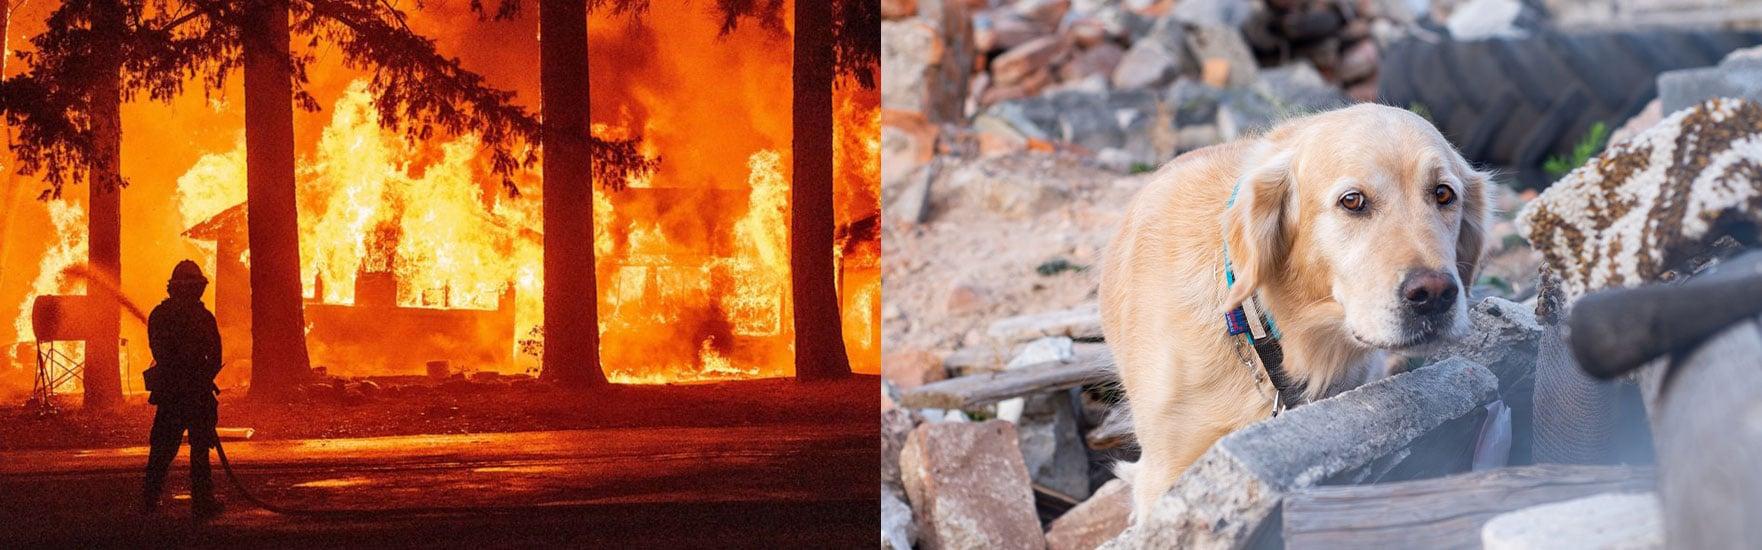 disaster-wildfire-impactupdates-header-image